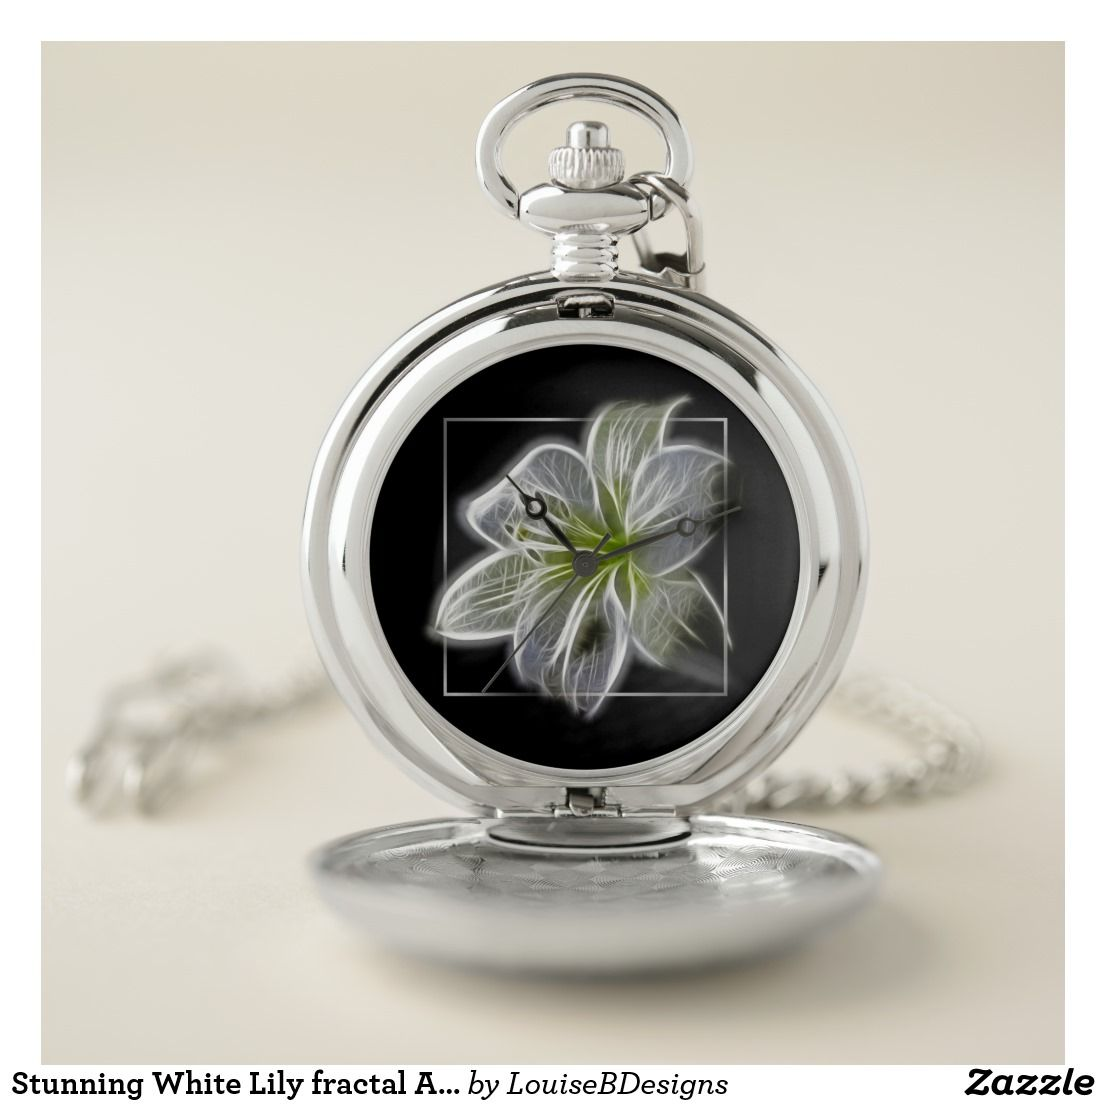 1d4e3511f Stunning White Lily fractal Art Pocket Watch | Zazzle.com | Elegant ...